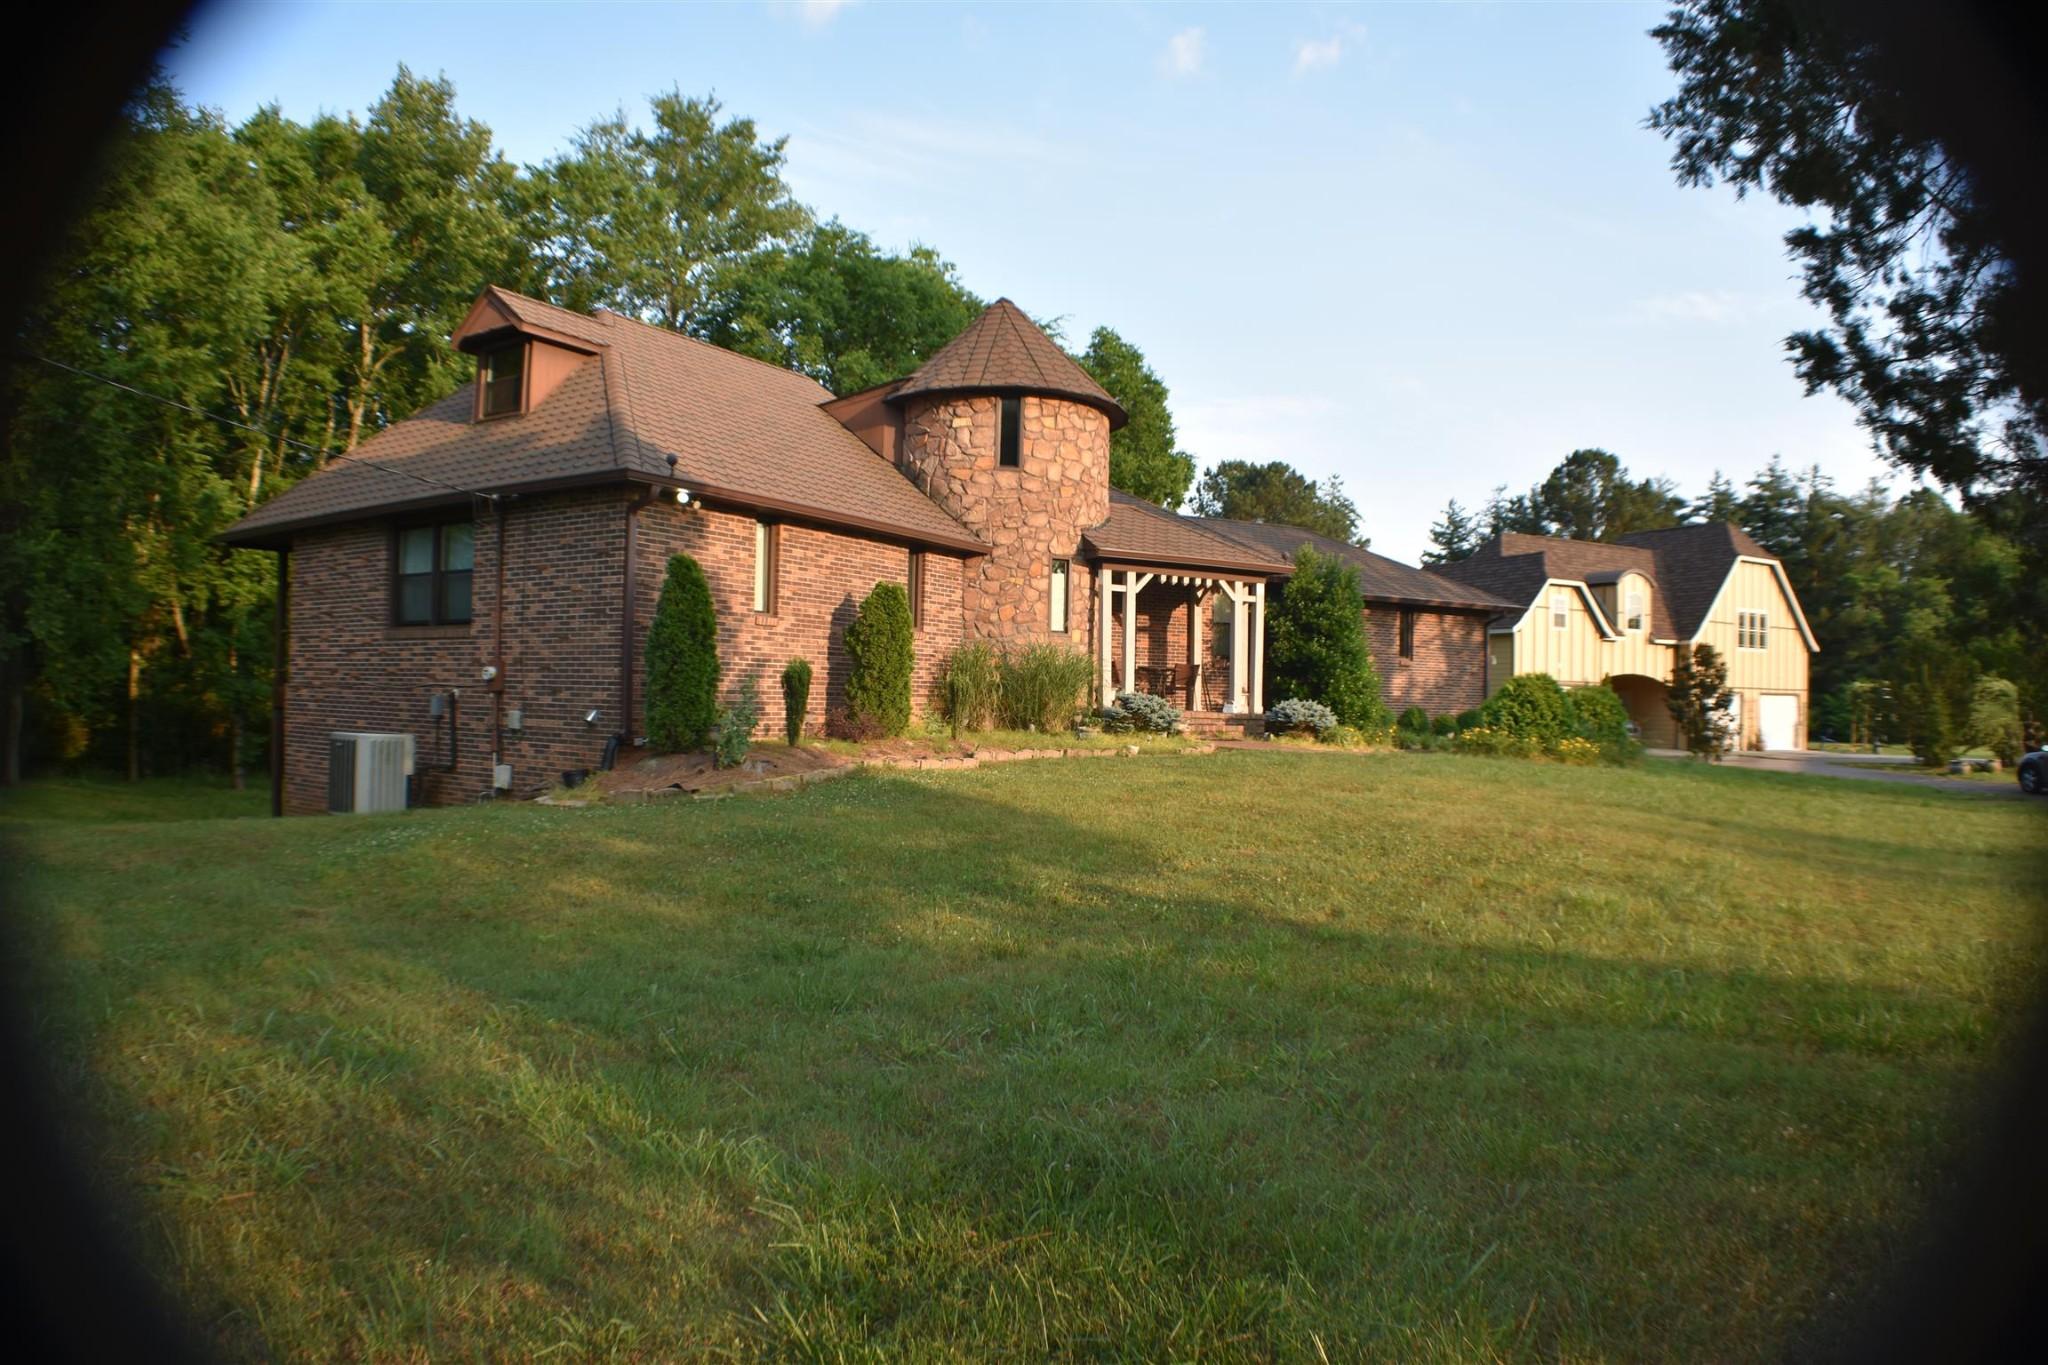 2201 Primm Ln, Murfreesboro, TN 37129 - Murfreesboro, TN real estate listing